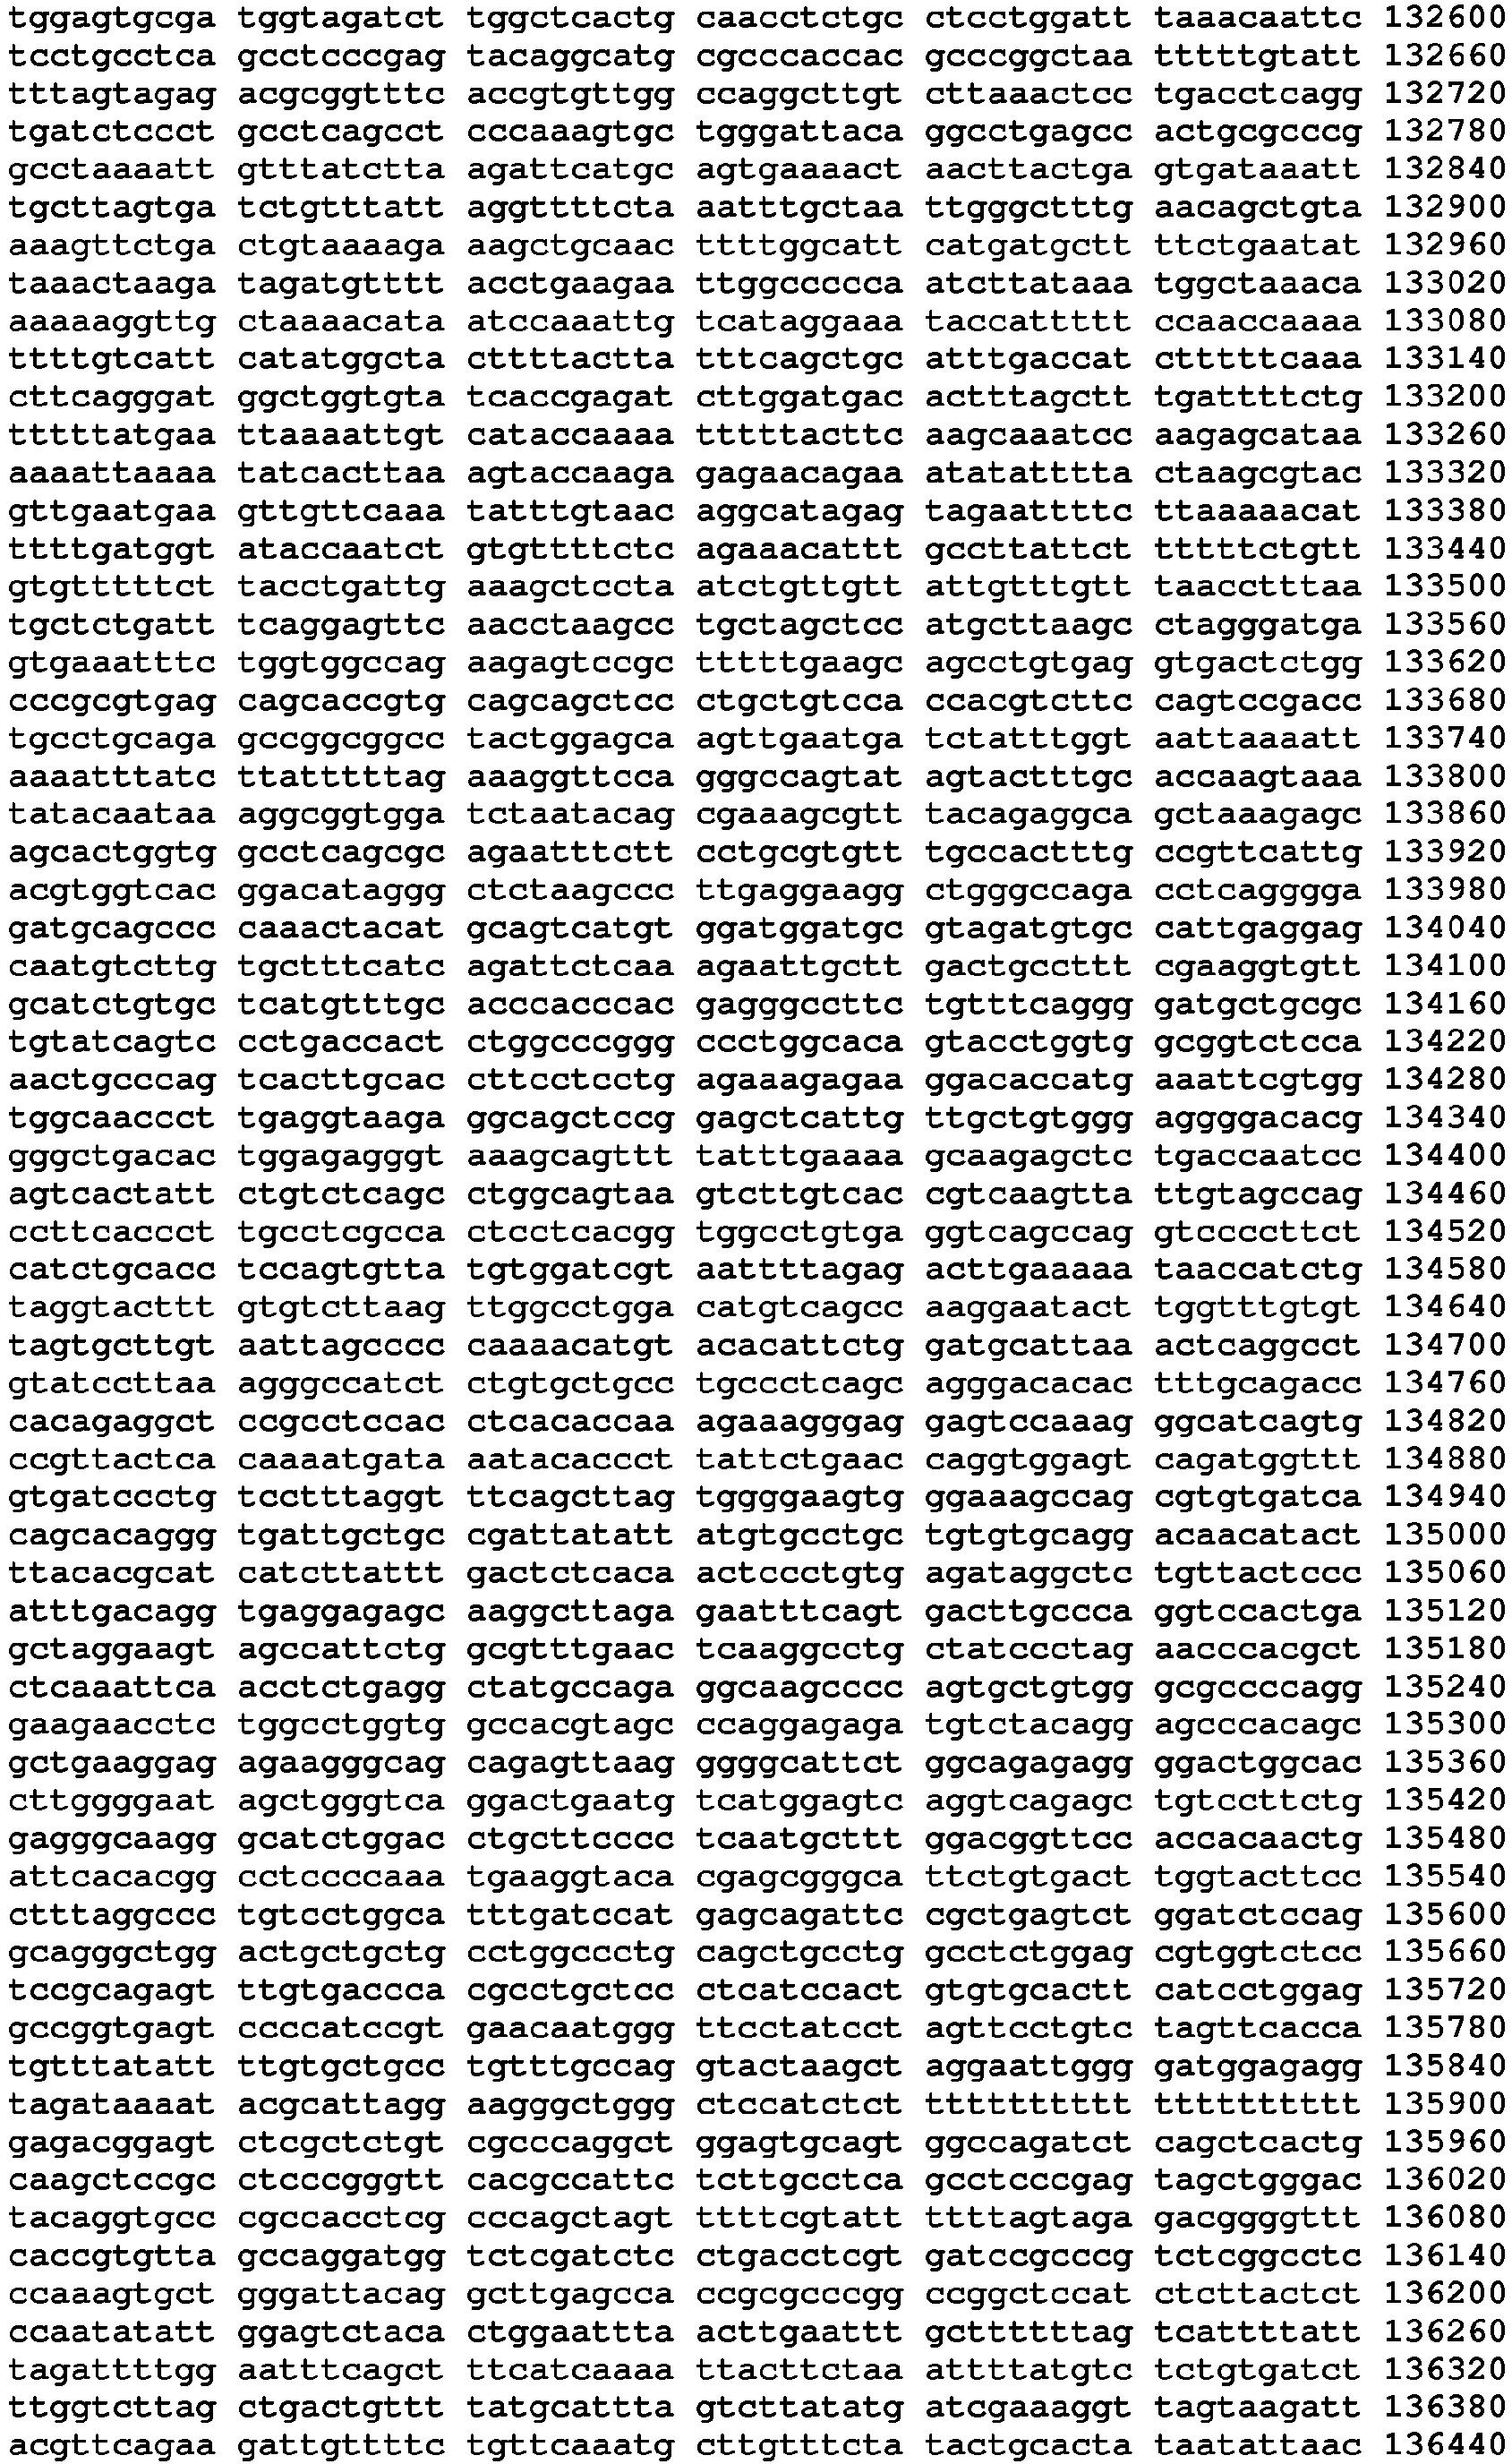 Figure imgb0089